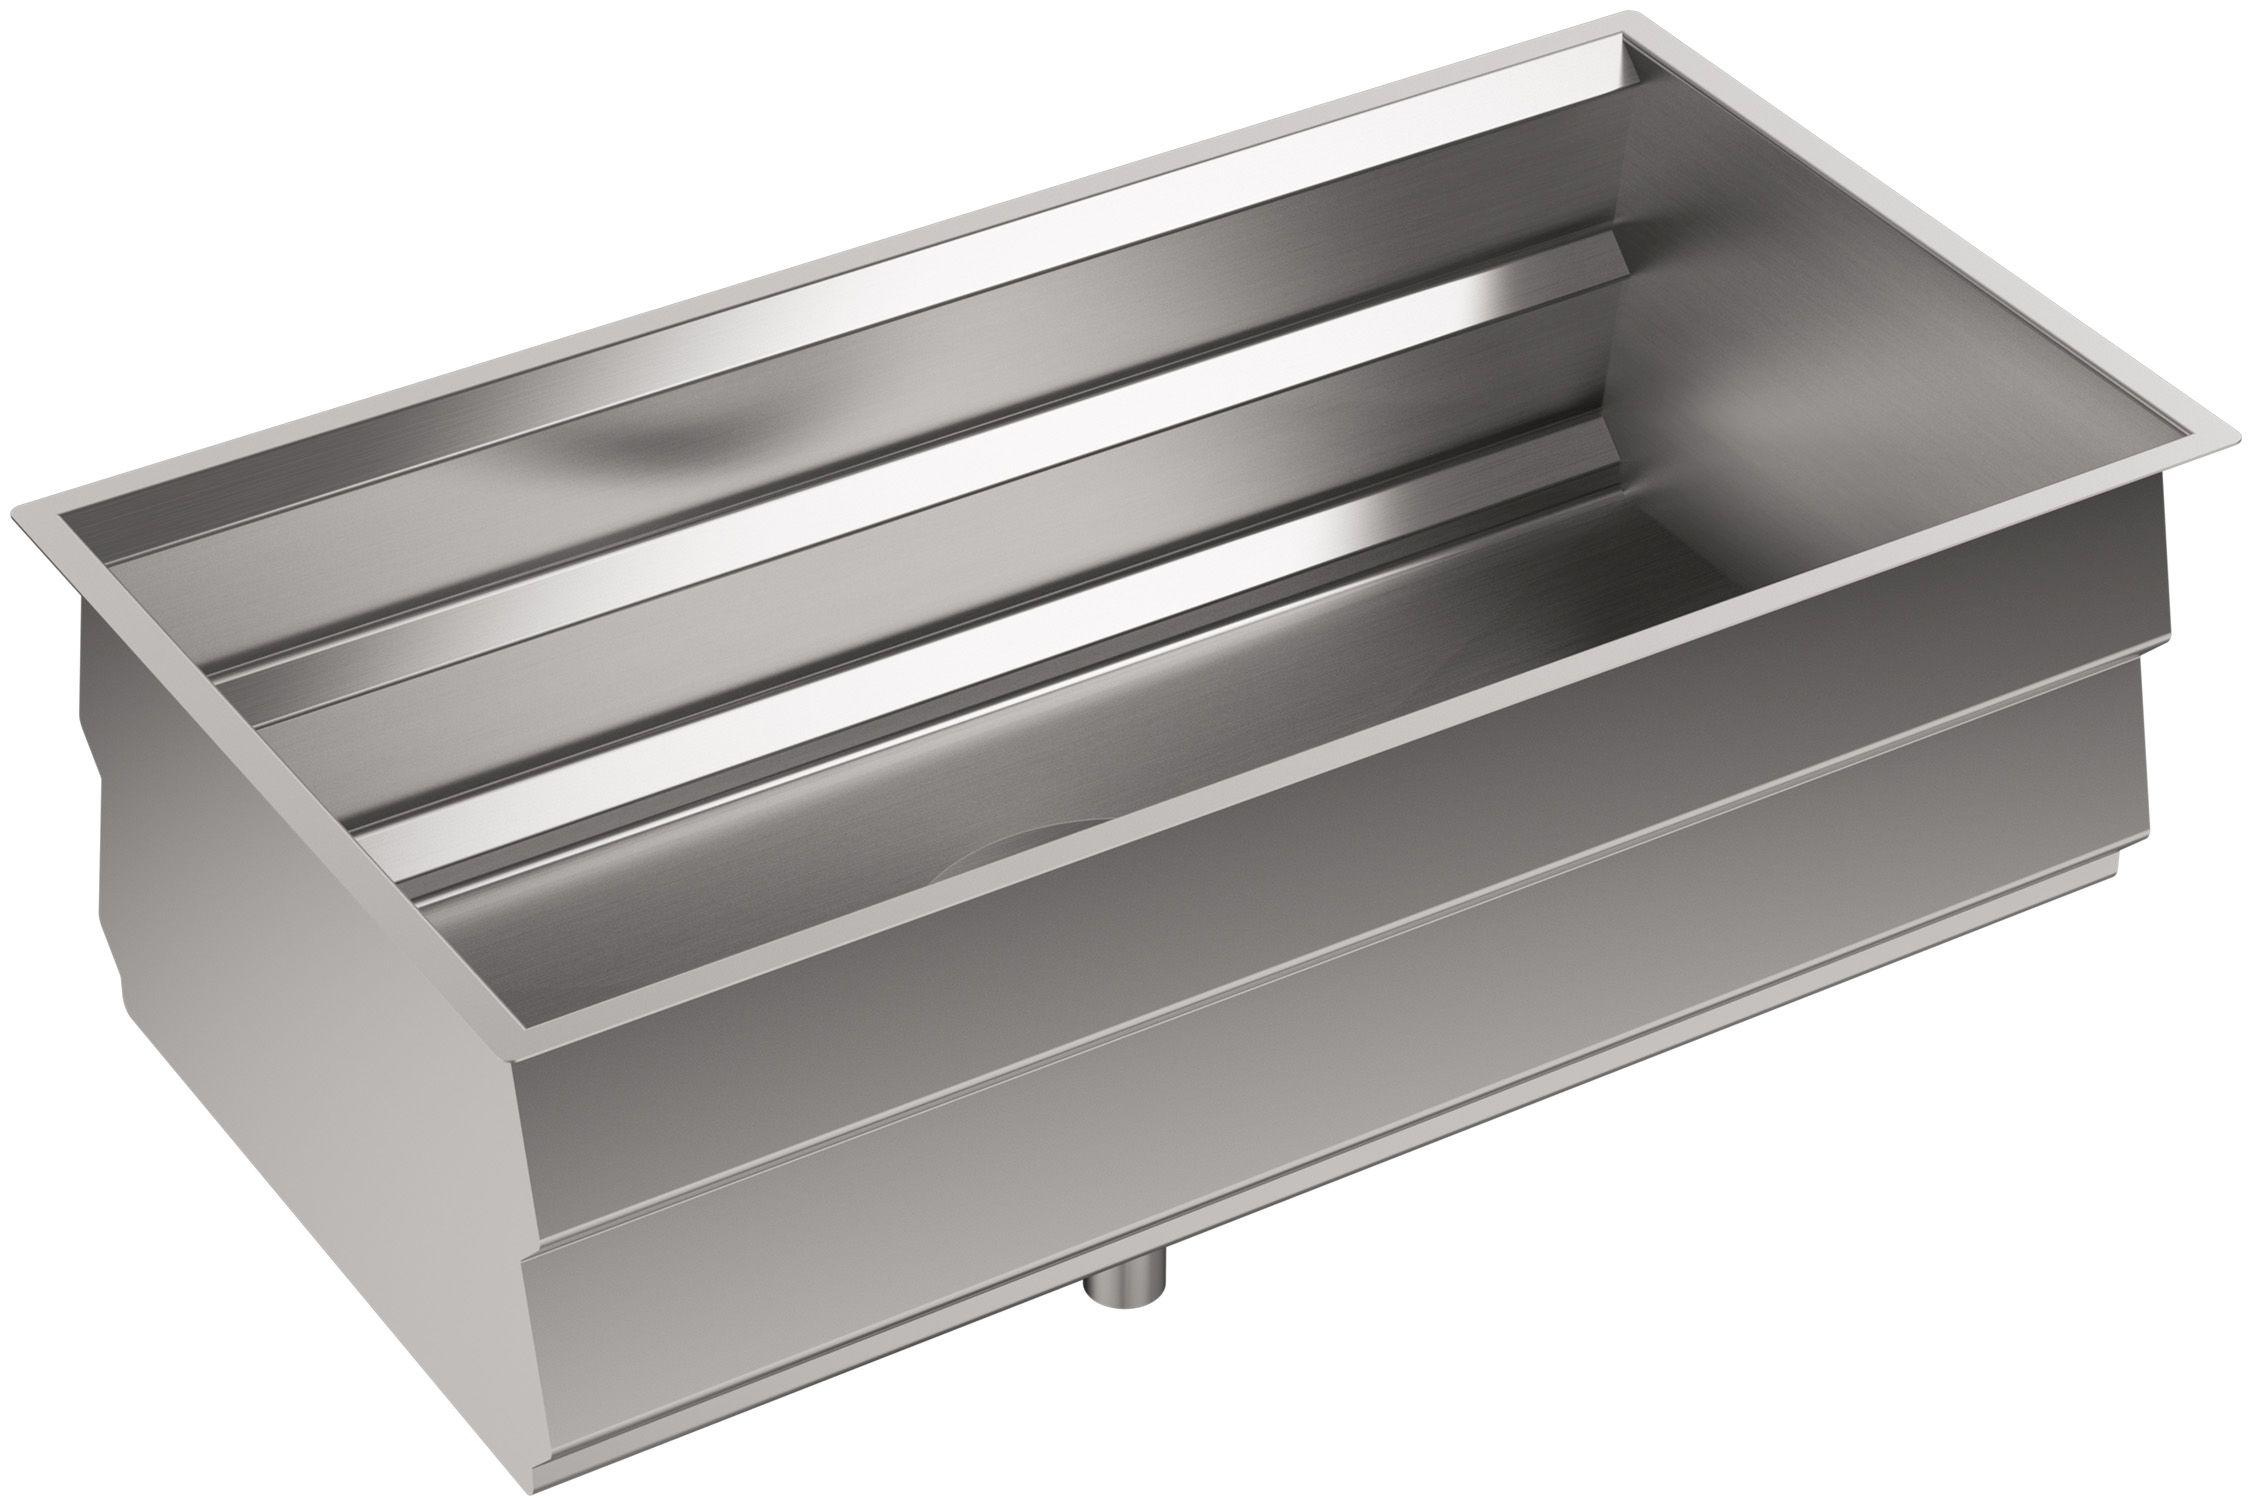 kitchen sinks stainless kitchen sinks undermount sinks build